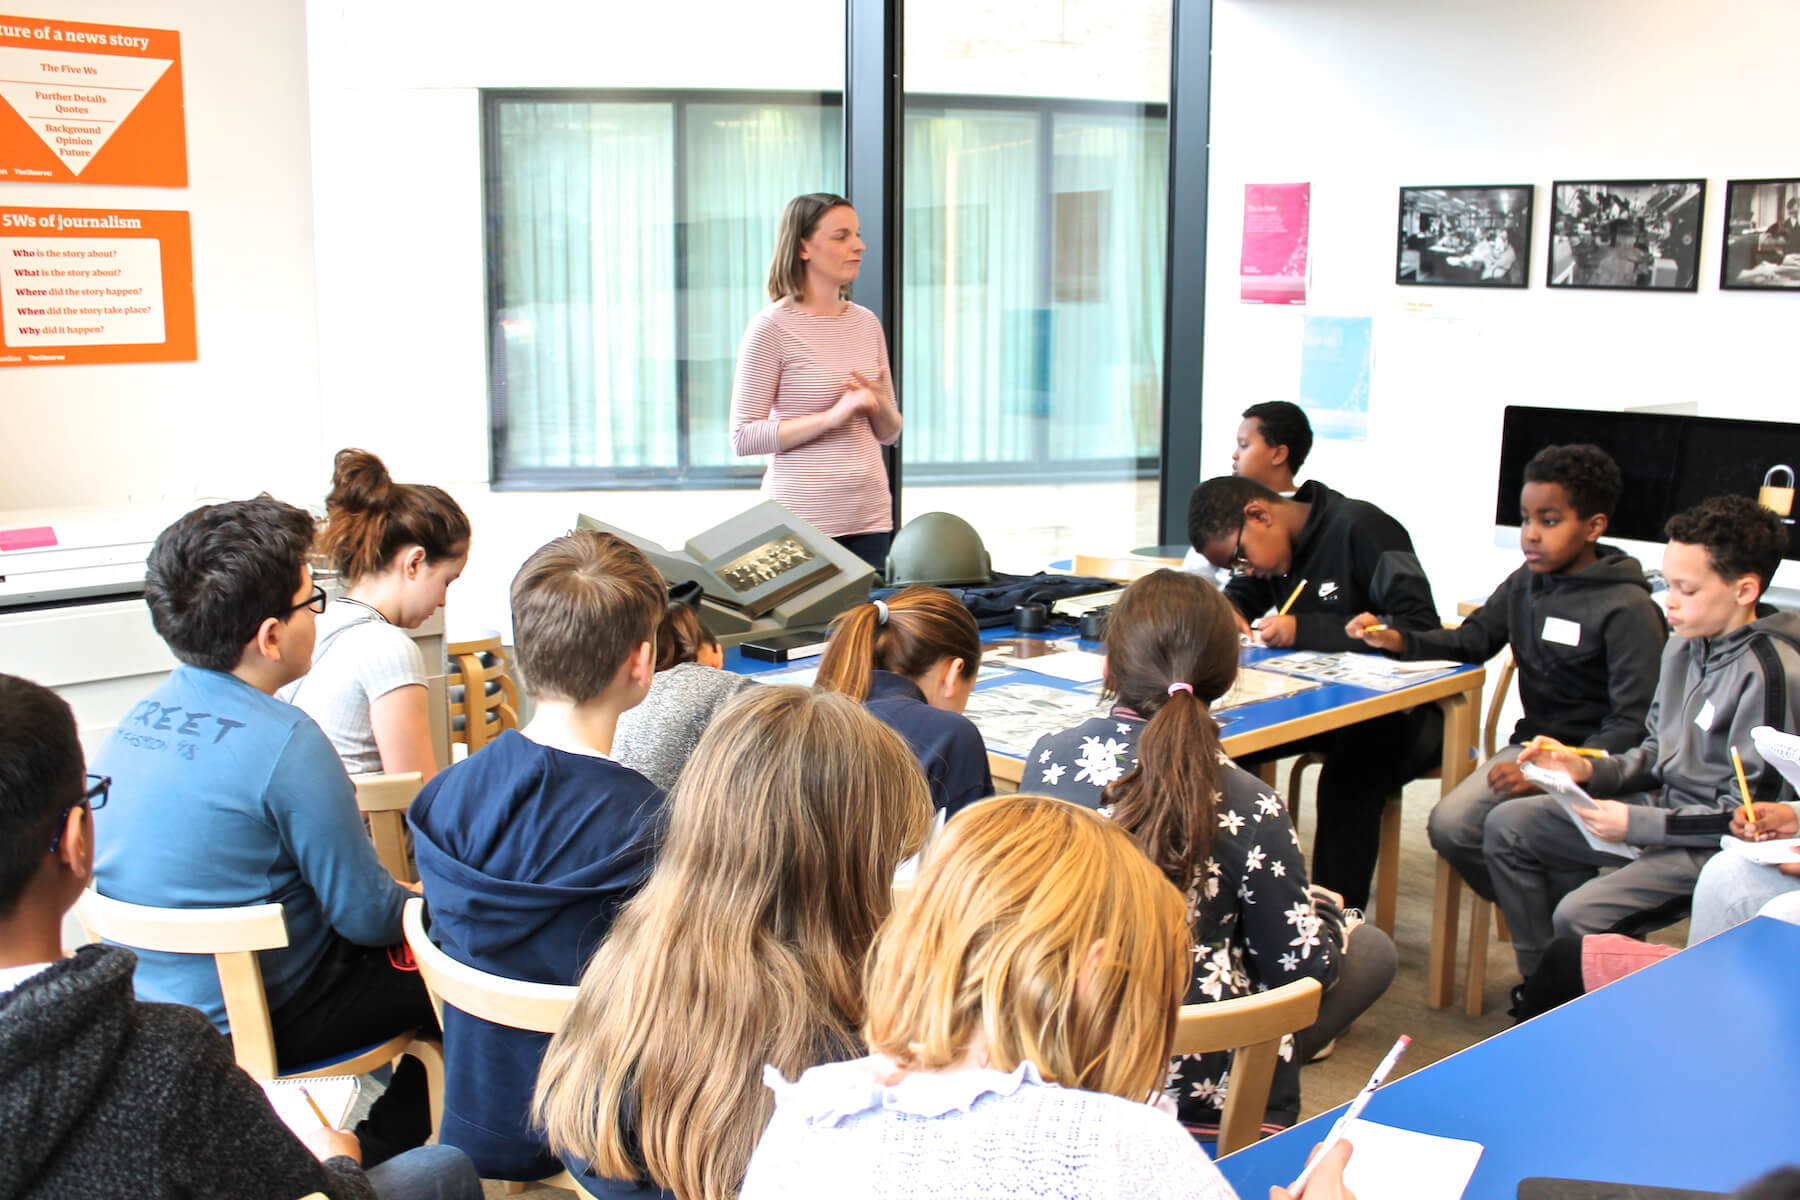 Archive workshop at Education Centre, Guardian Foundation